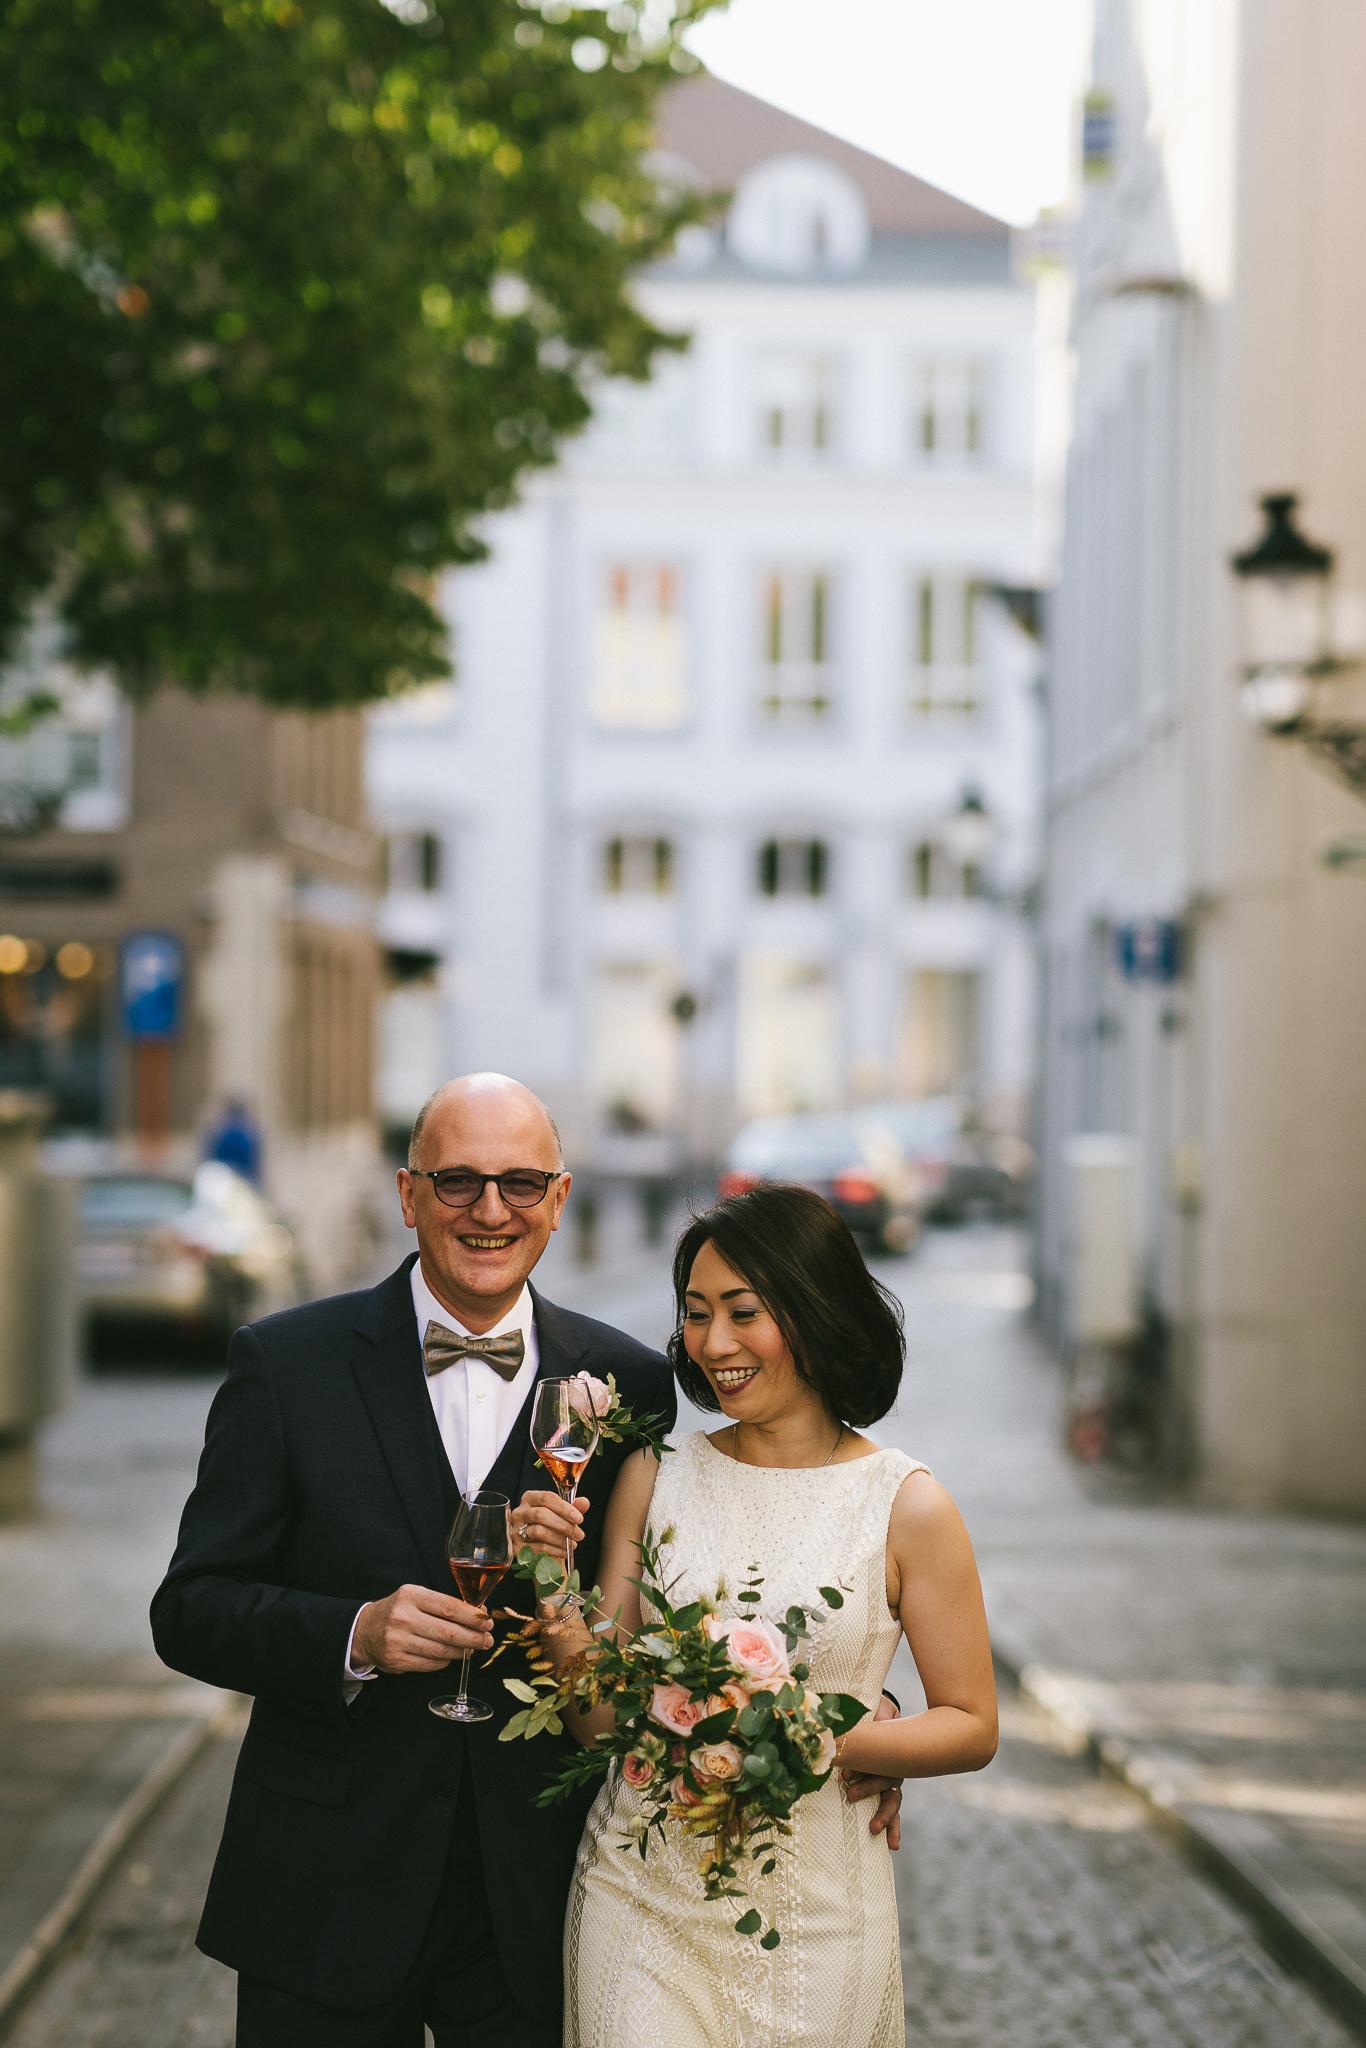 Wedding-Dona&Chris-10102018-small-207.jpg